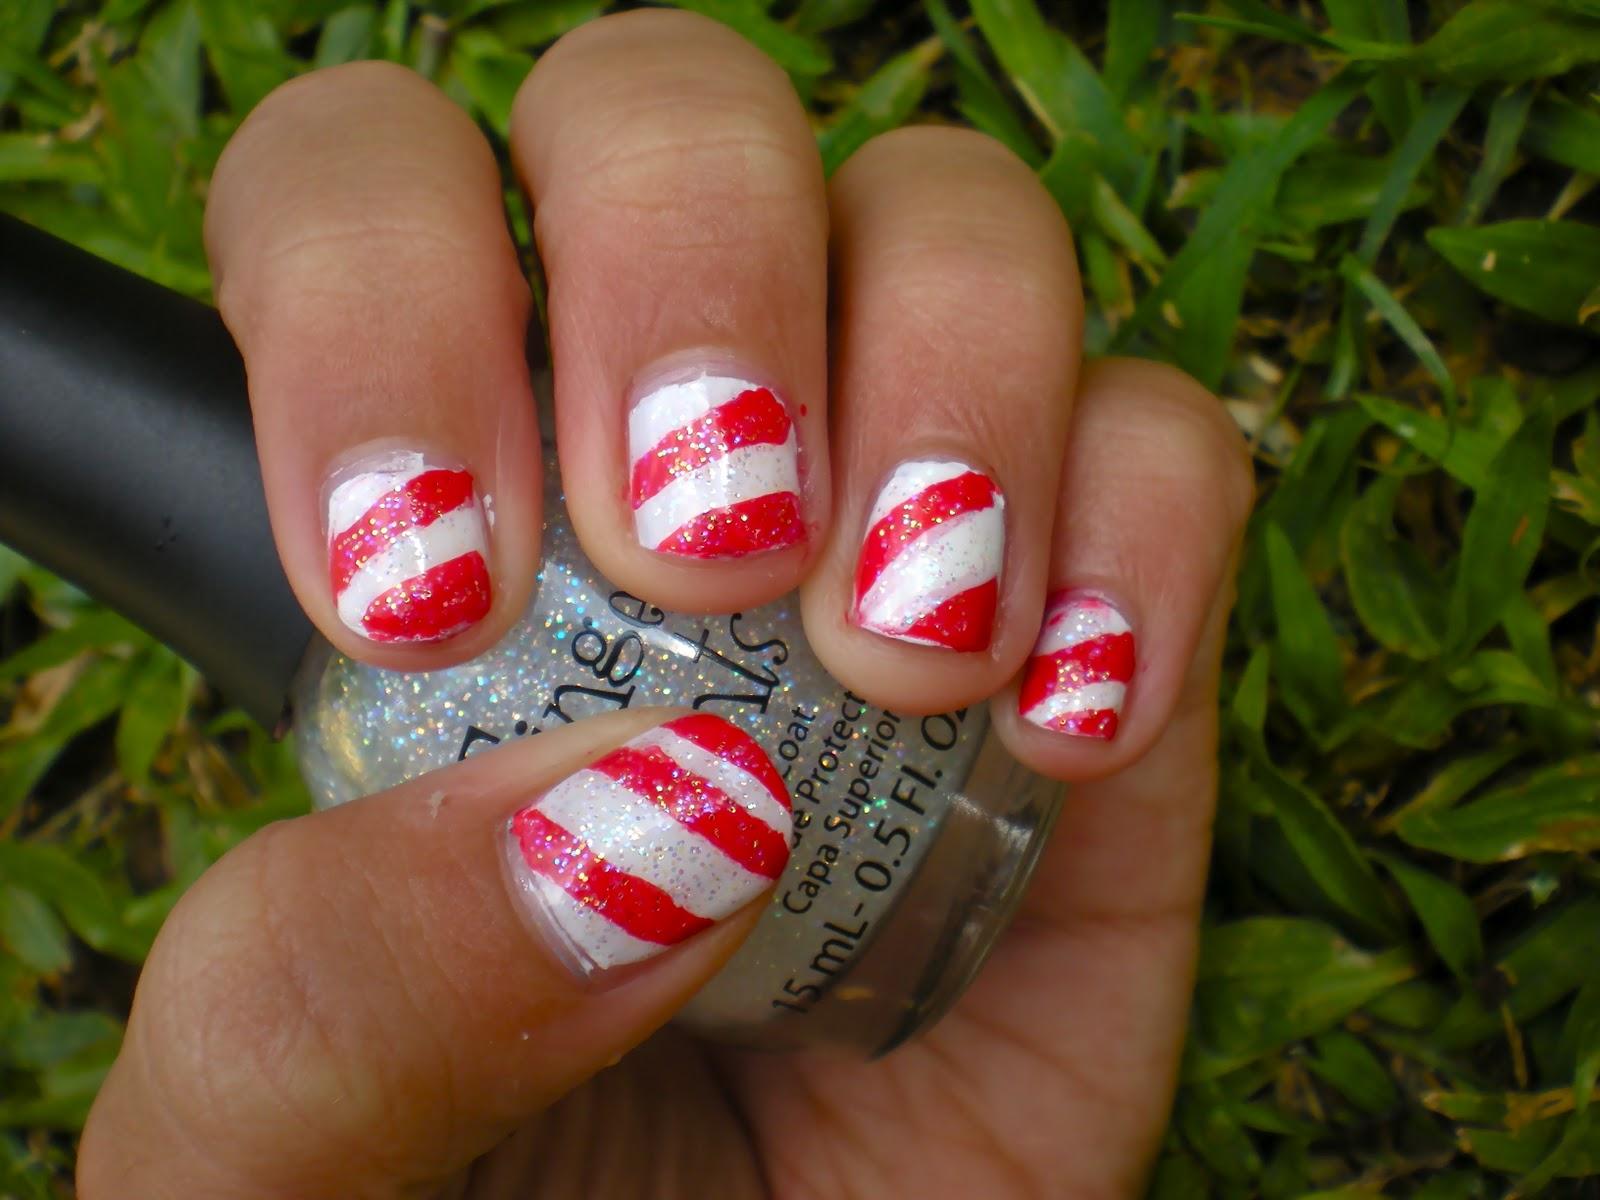 Posh for Polish: Candy Cane Nails